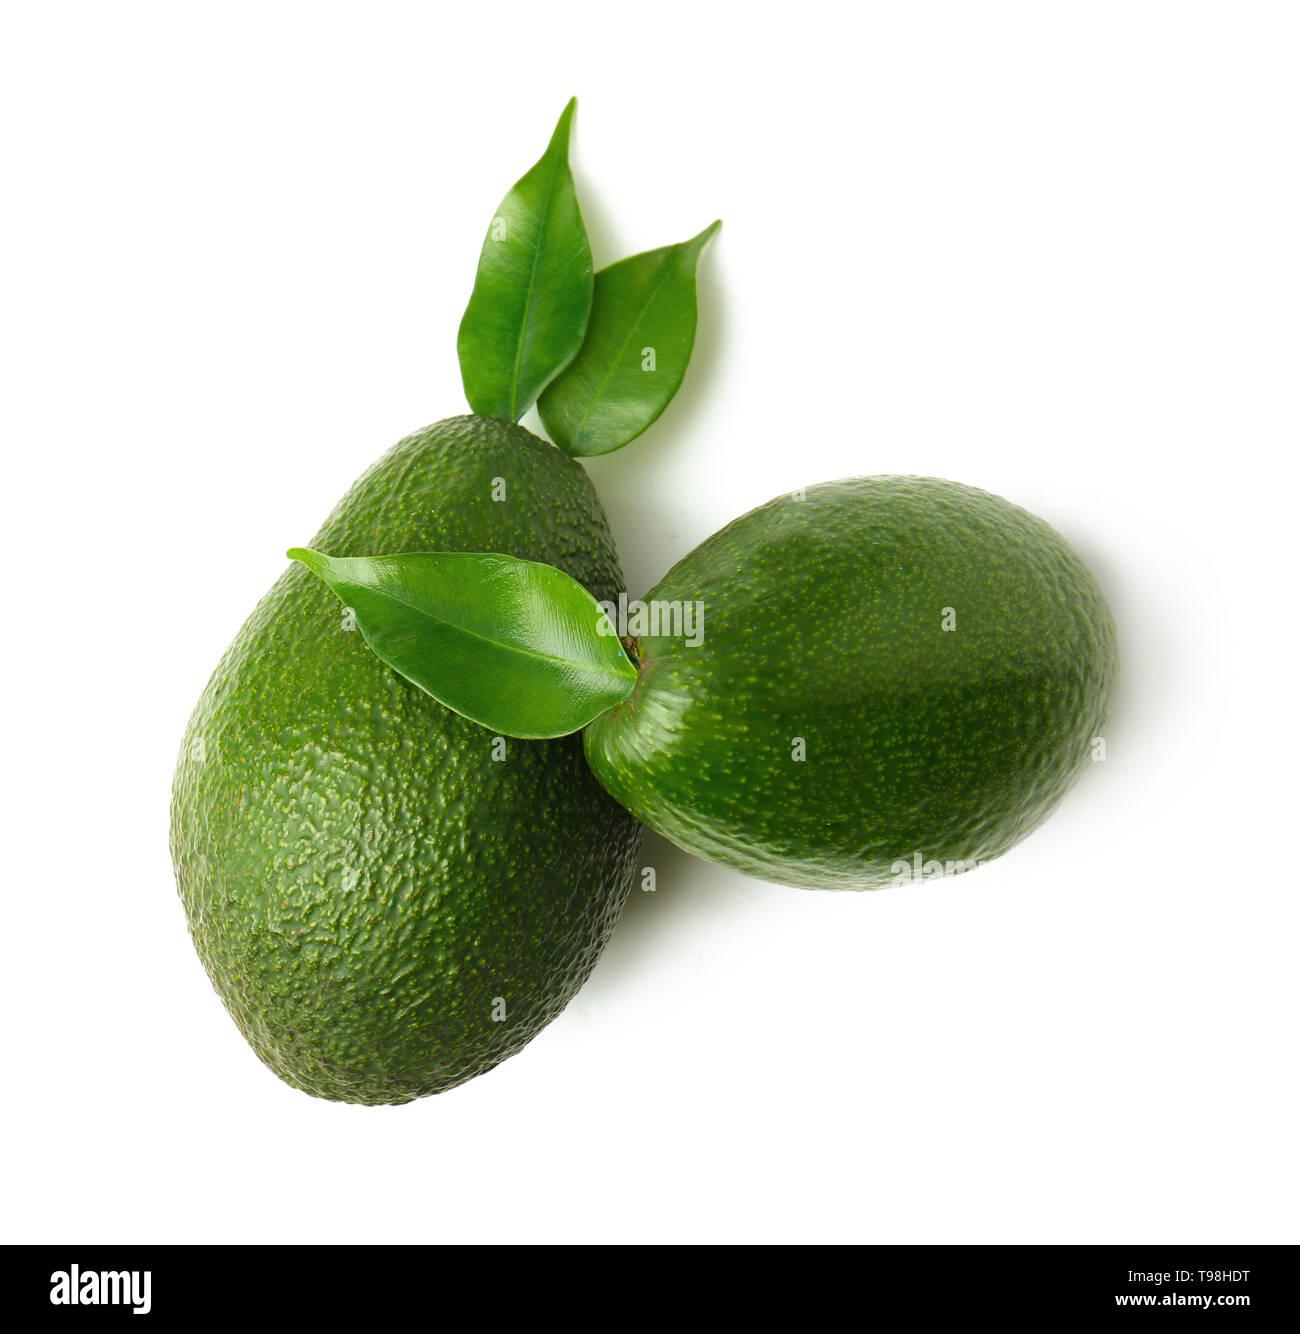 Ripe fresh avocados on white background - Stock Image